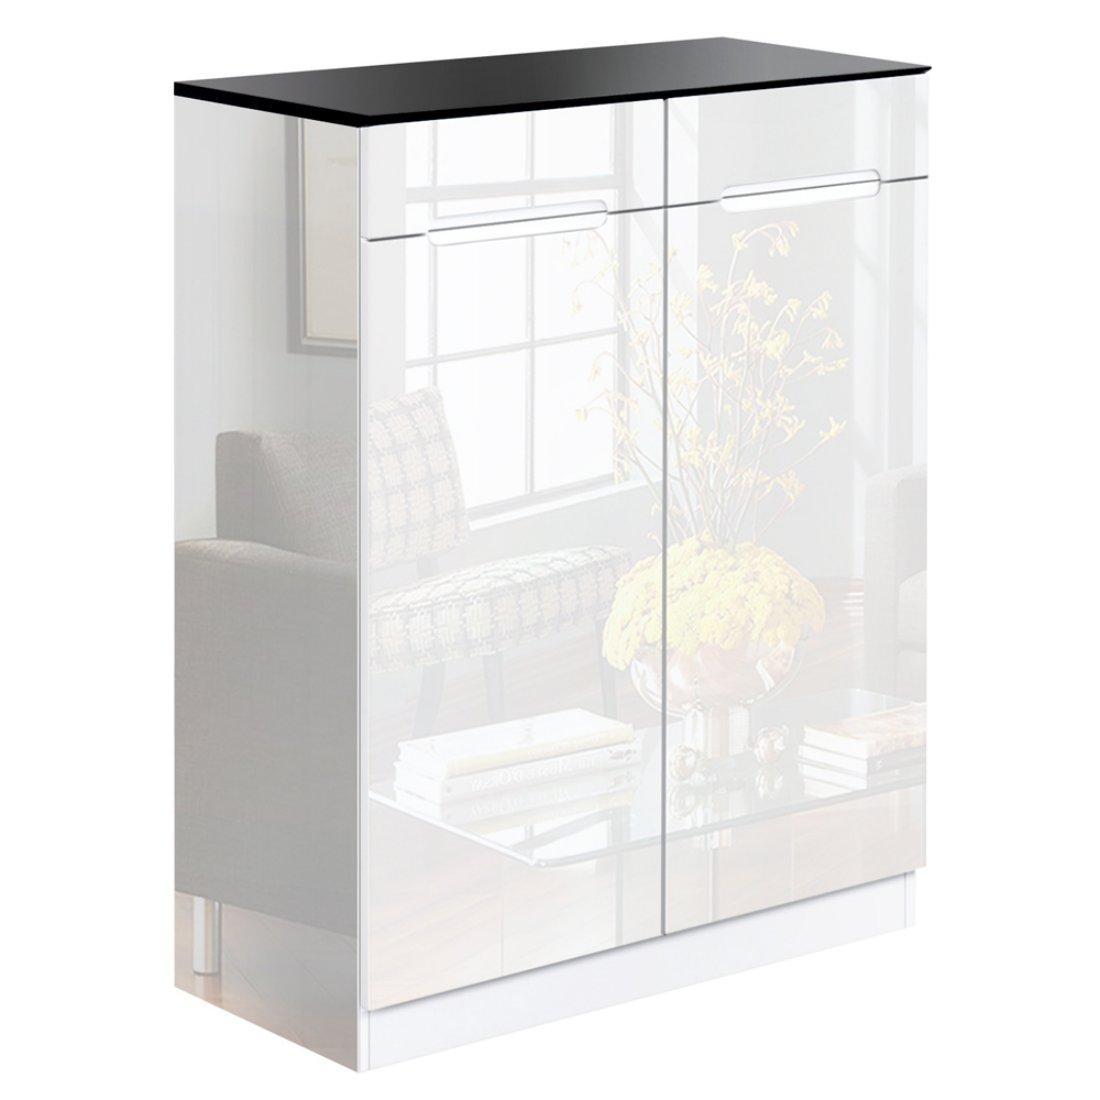 High Gloss Shoe Cabinet Rack Black / White